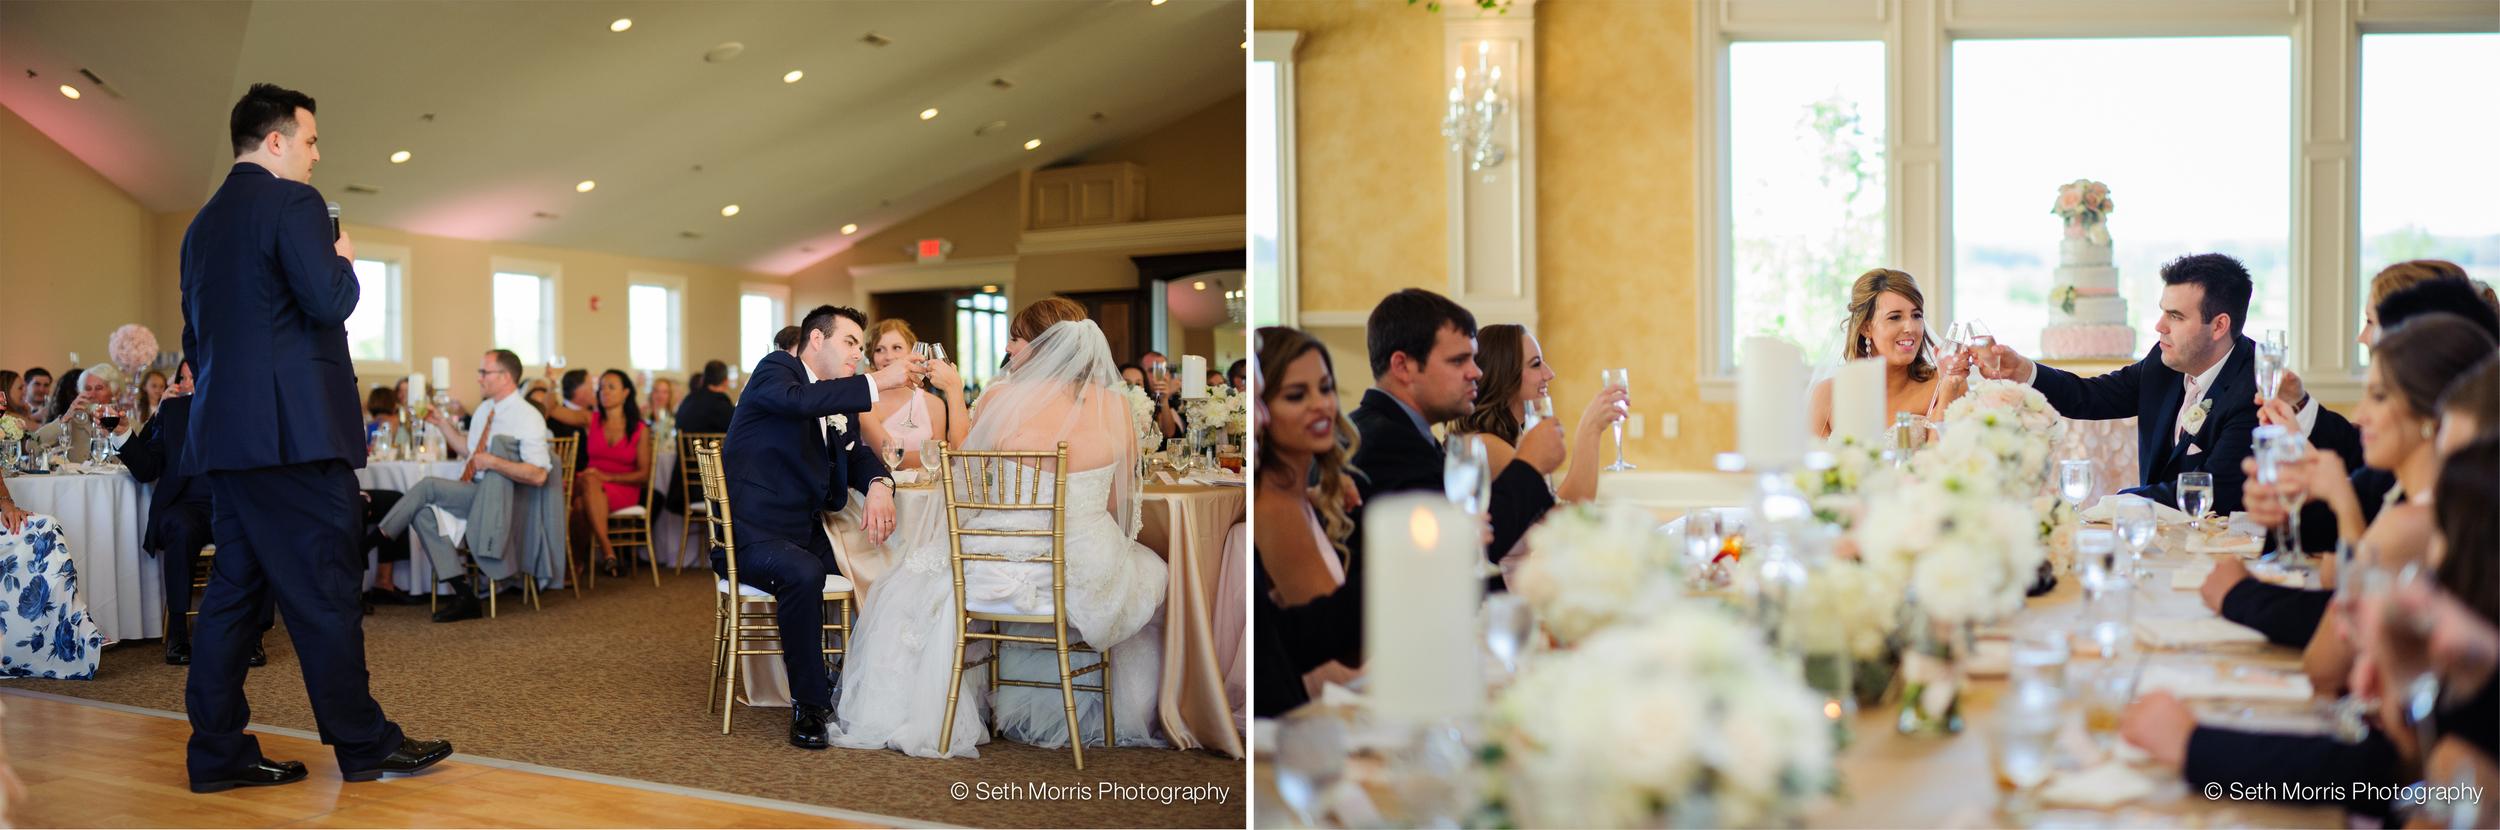 metamora-fields-wedding-photographer-peoria-174.jpg